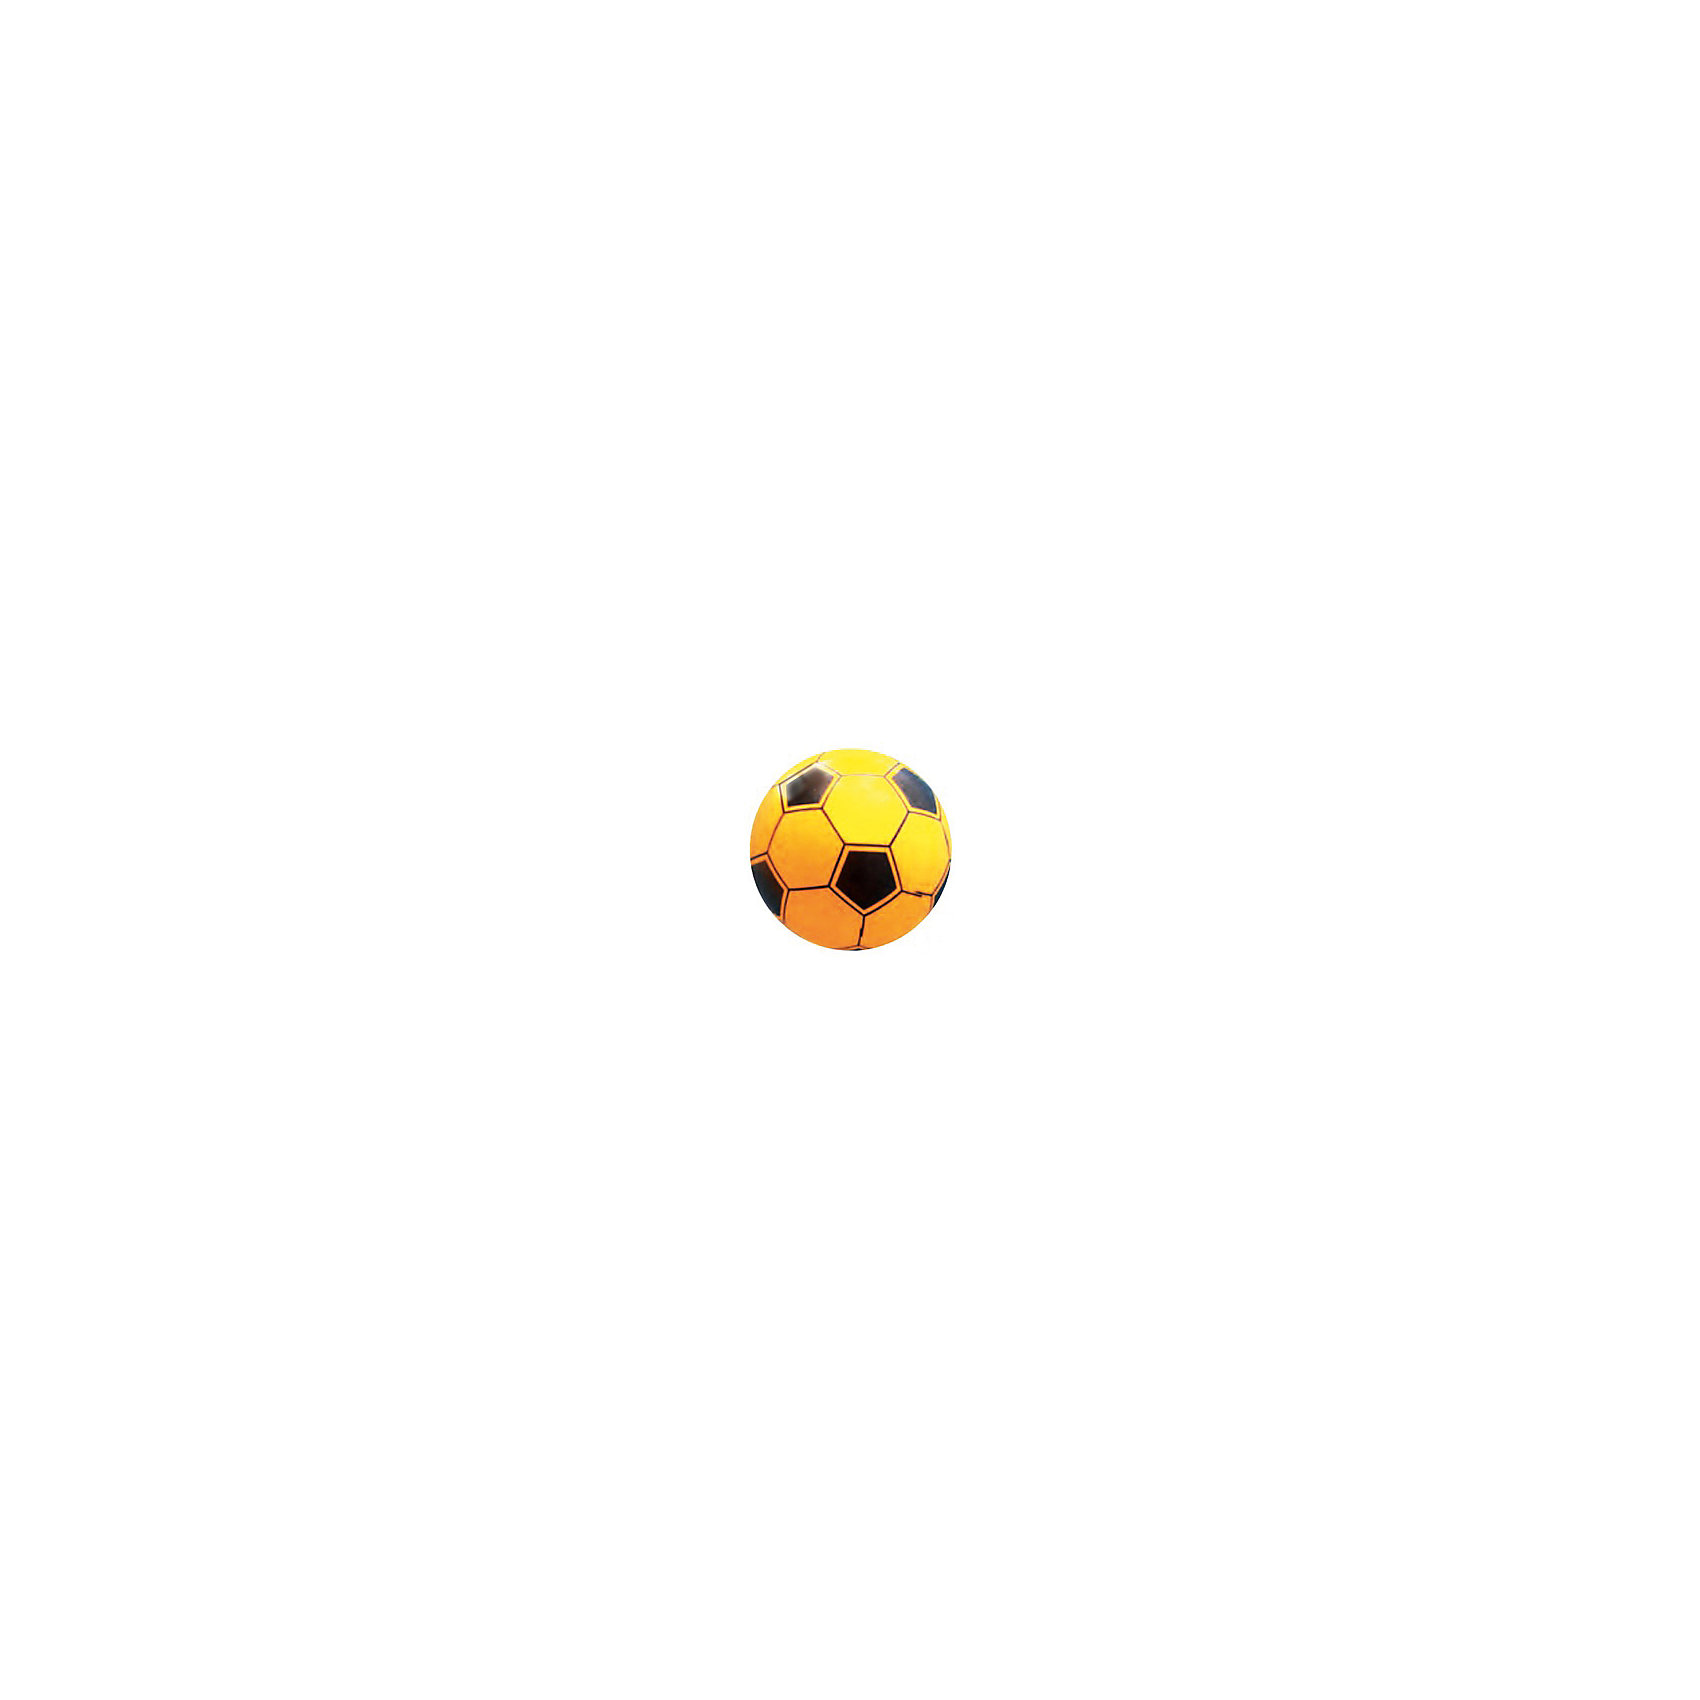 Мяч Классика футбола, 20 см, InSummer<br><br>Ширина мм: 200<br>Глубина мм: 100<br>Высота мм: 50<br>Вес г: 22<br>Возраст от месяцев: 36<br>Возраст до месяцев: 120<br>Пол: Унисекс<br>Возраст: Детский<br>SKU: 4624453